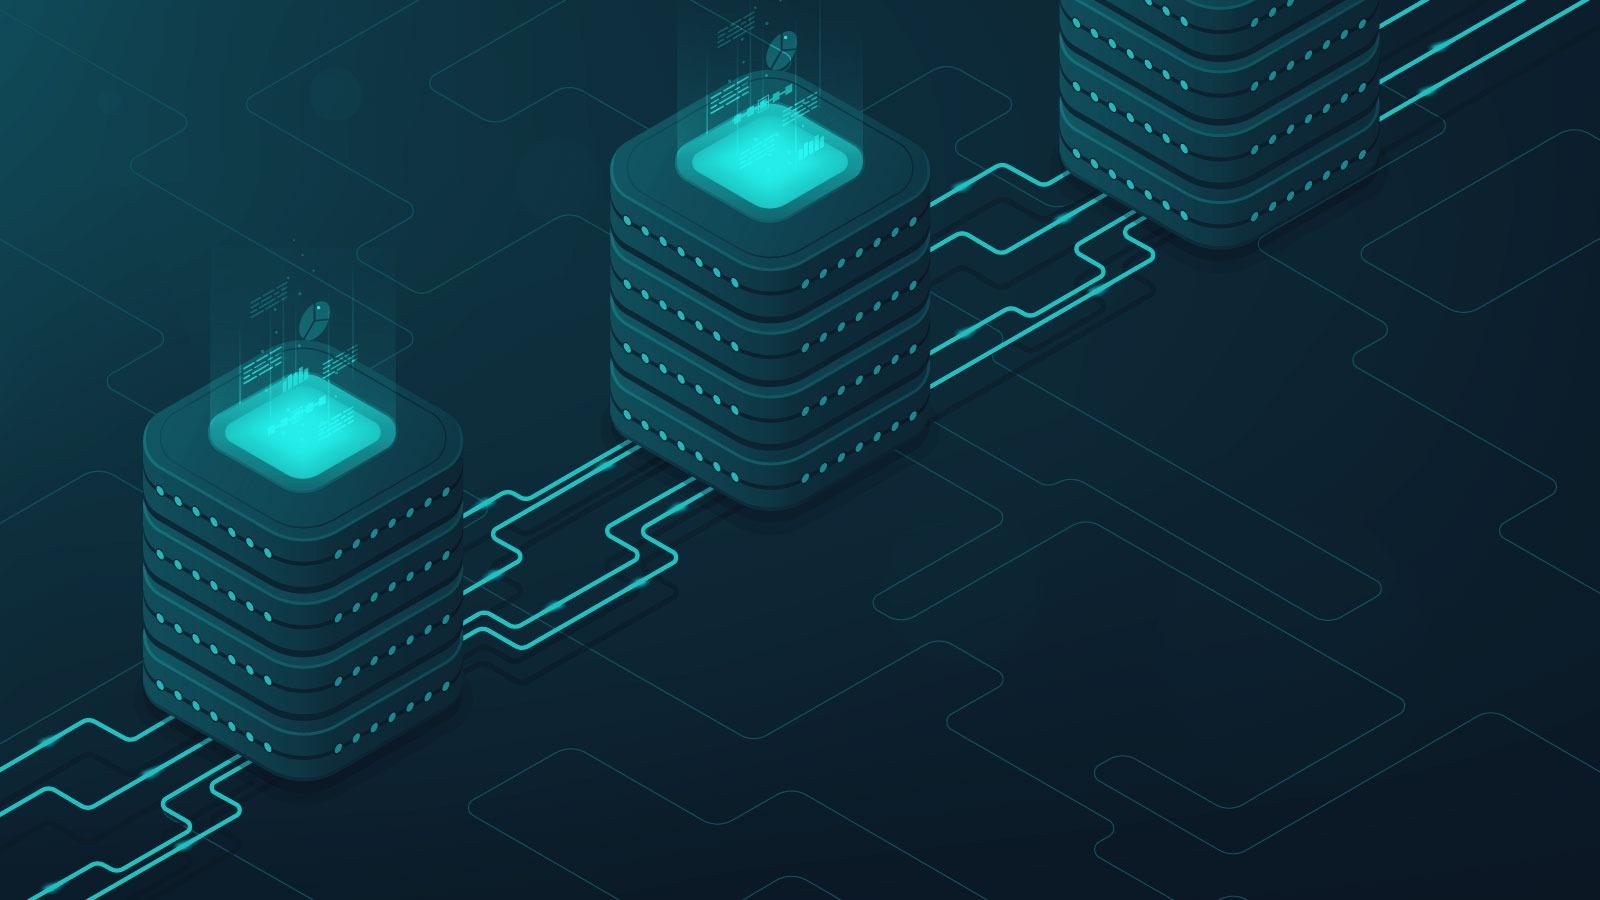 interconnected servers illustration